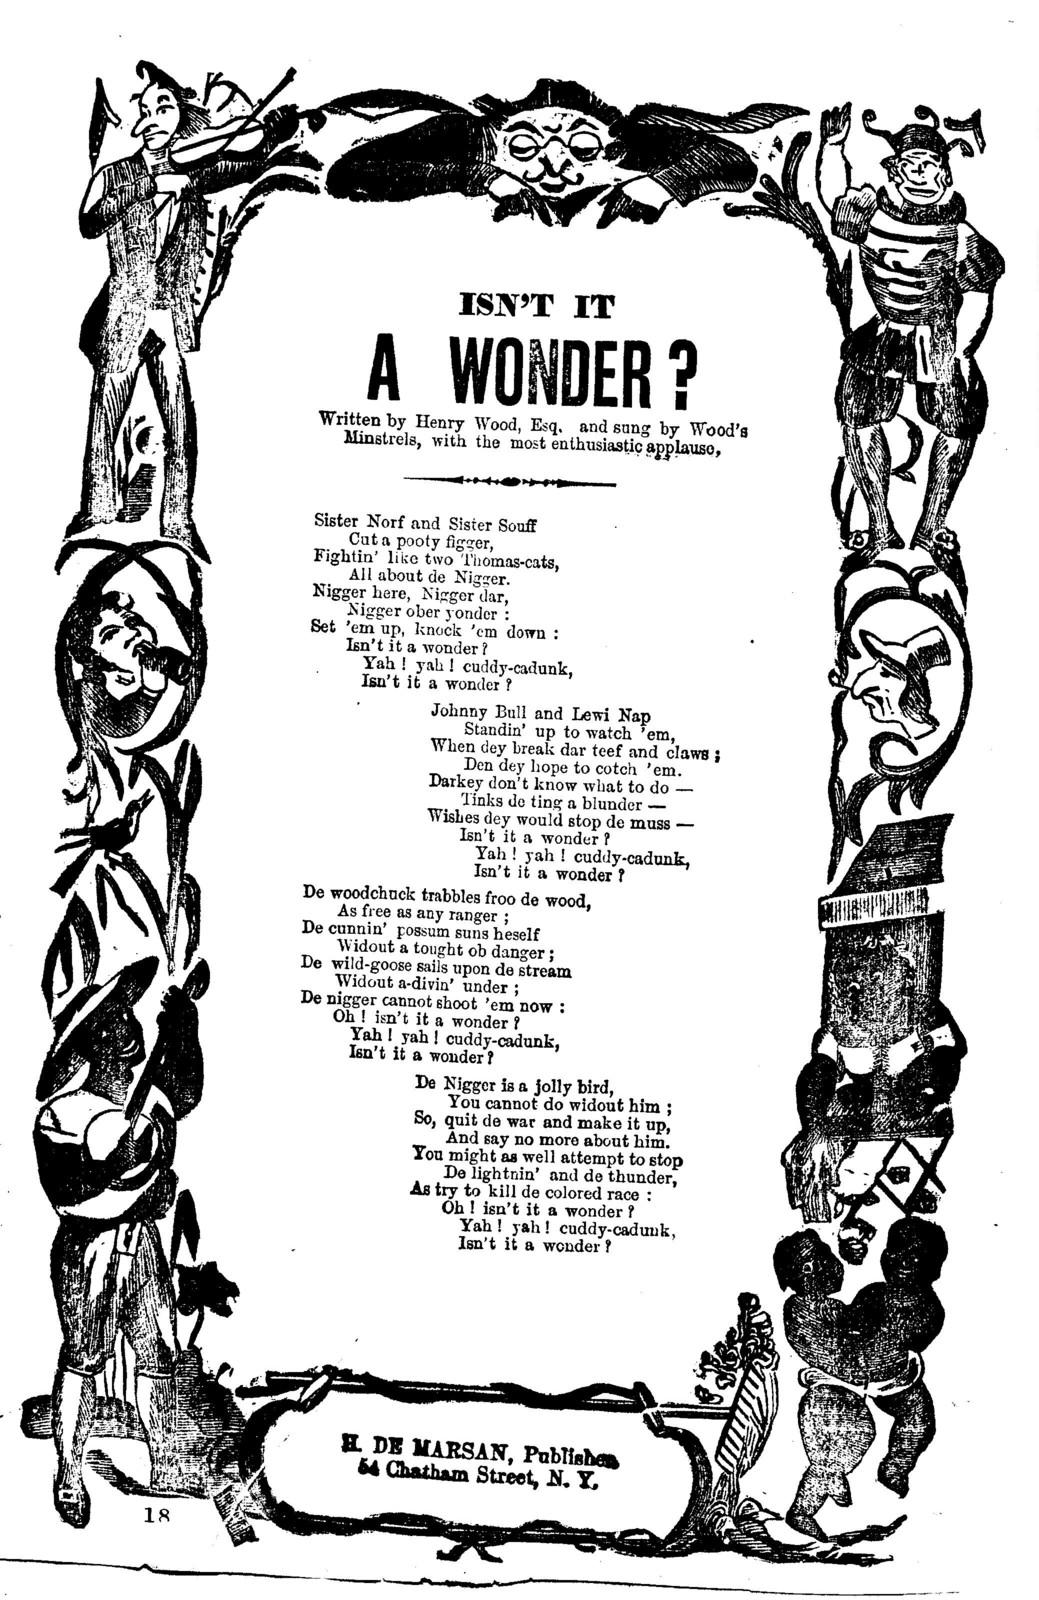 Isn't it a wonder? H. De Marsan, Publisher. No. 54 Chatham Street, N. Y. Publisher. No. 54 Chatham Street, N. Y